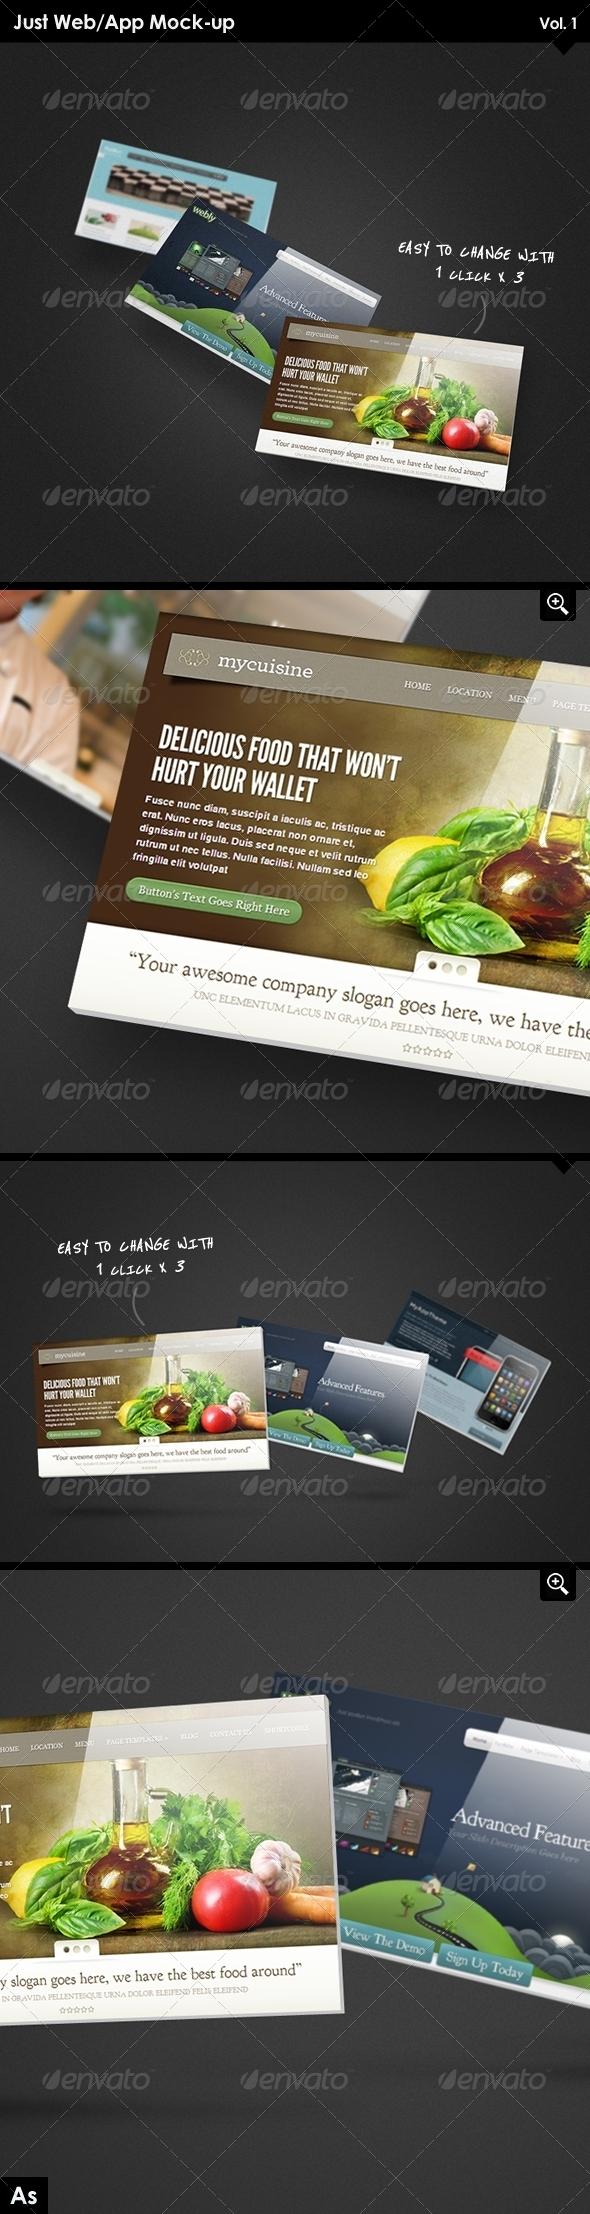 Just Web/App Mockup - Website Displays